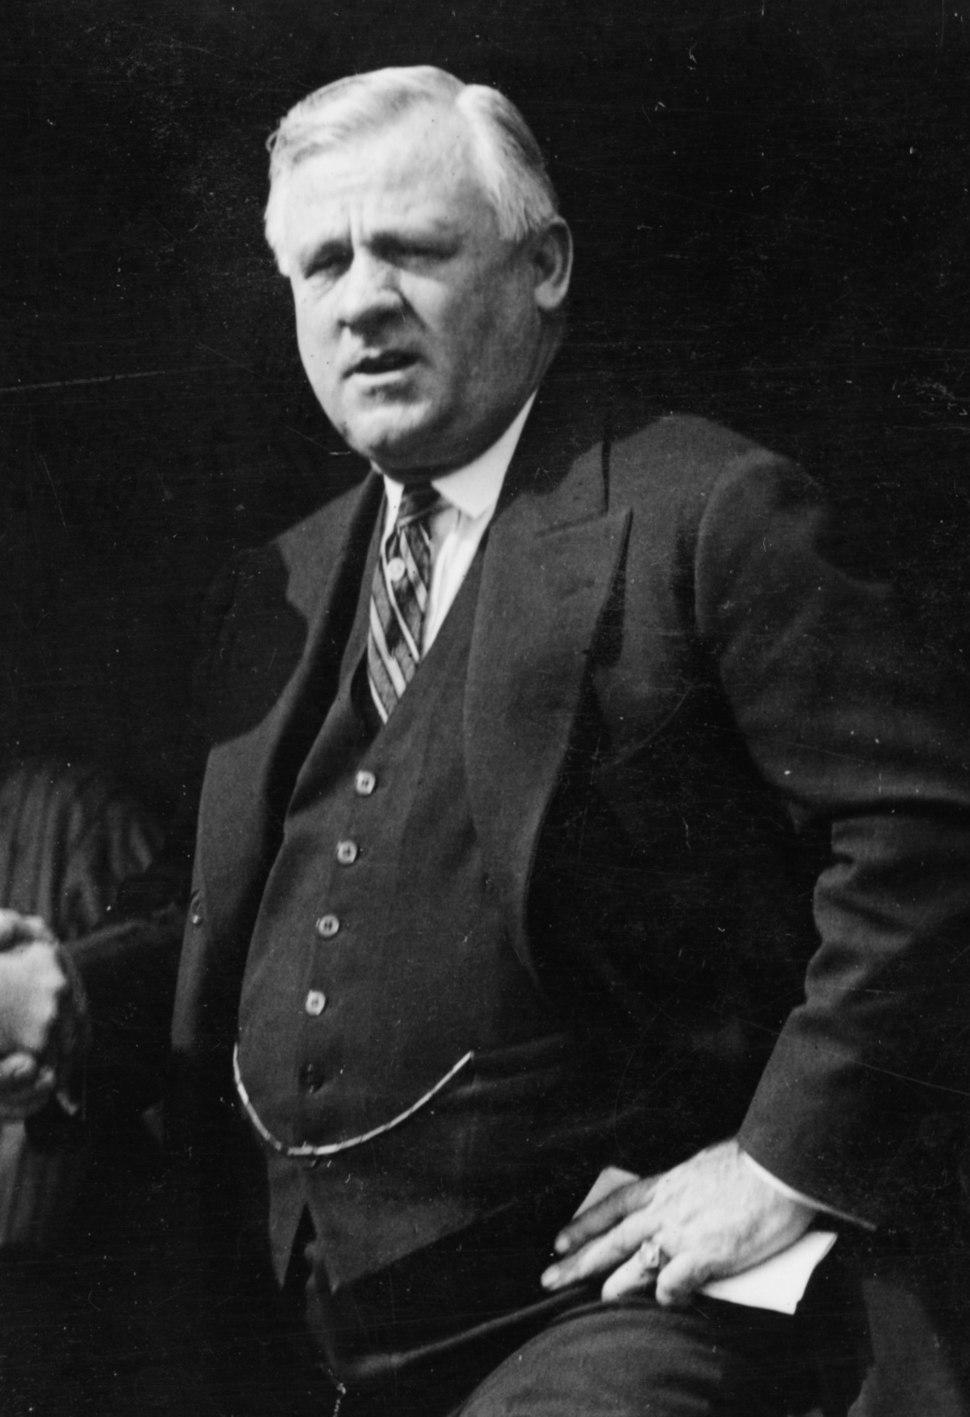 John McGraw 1924